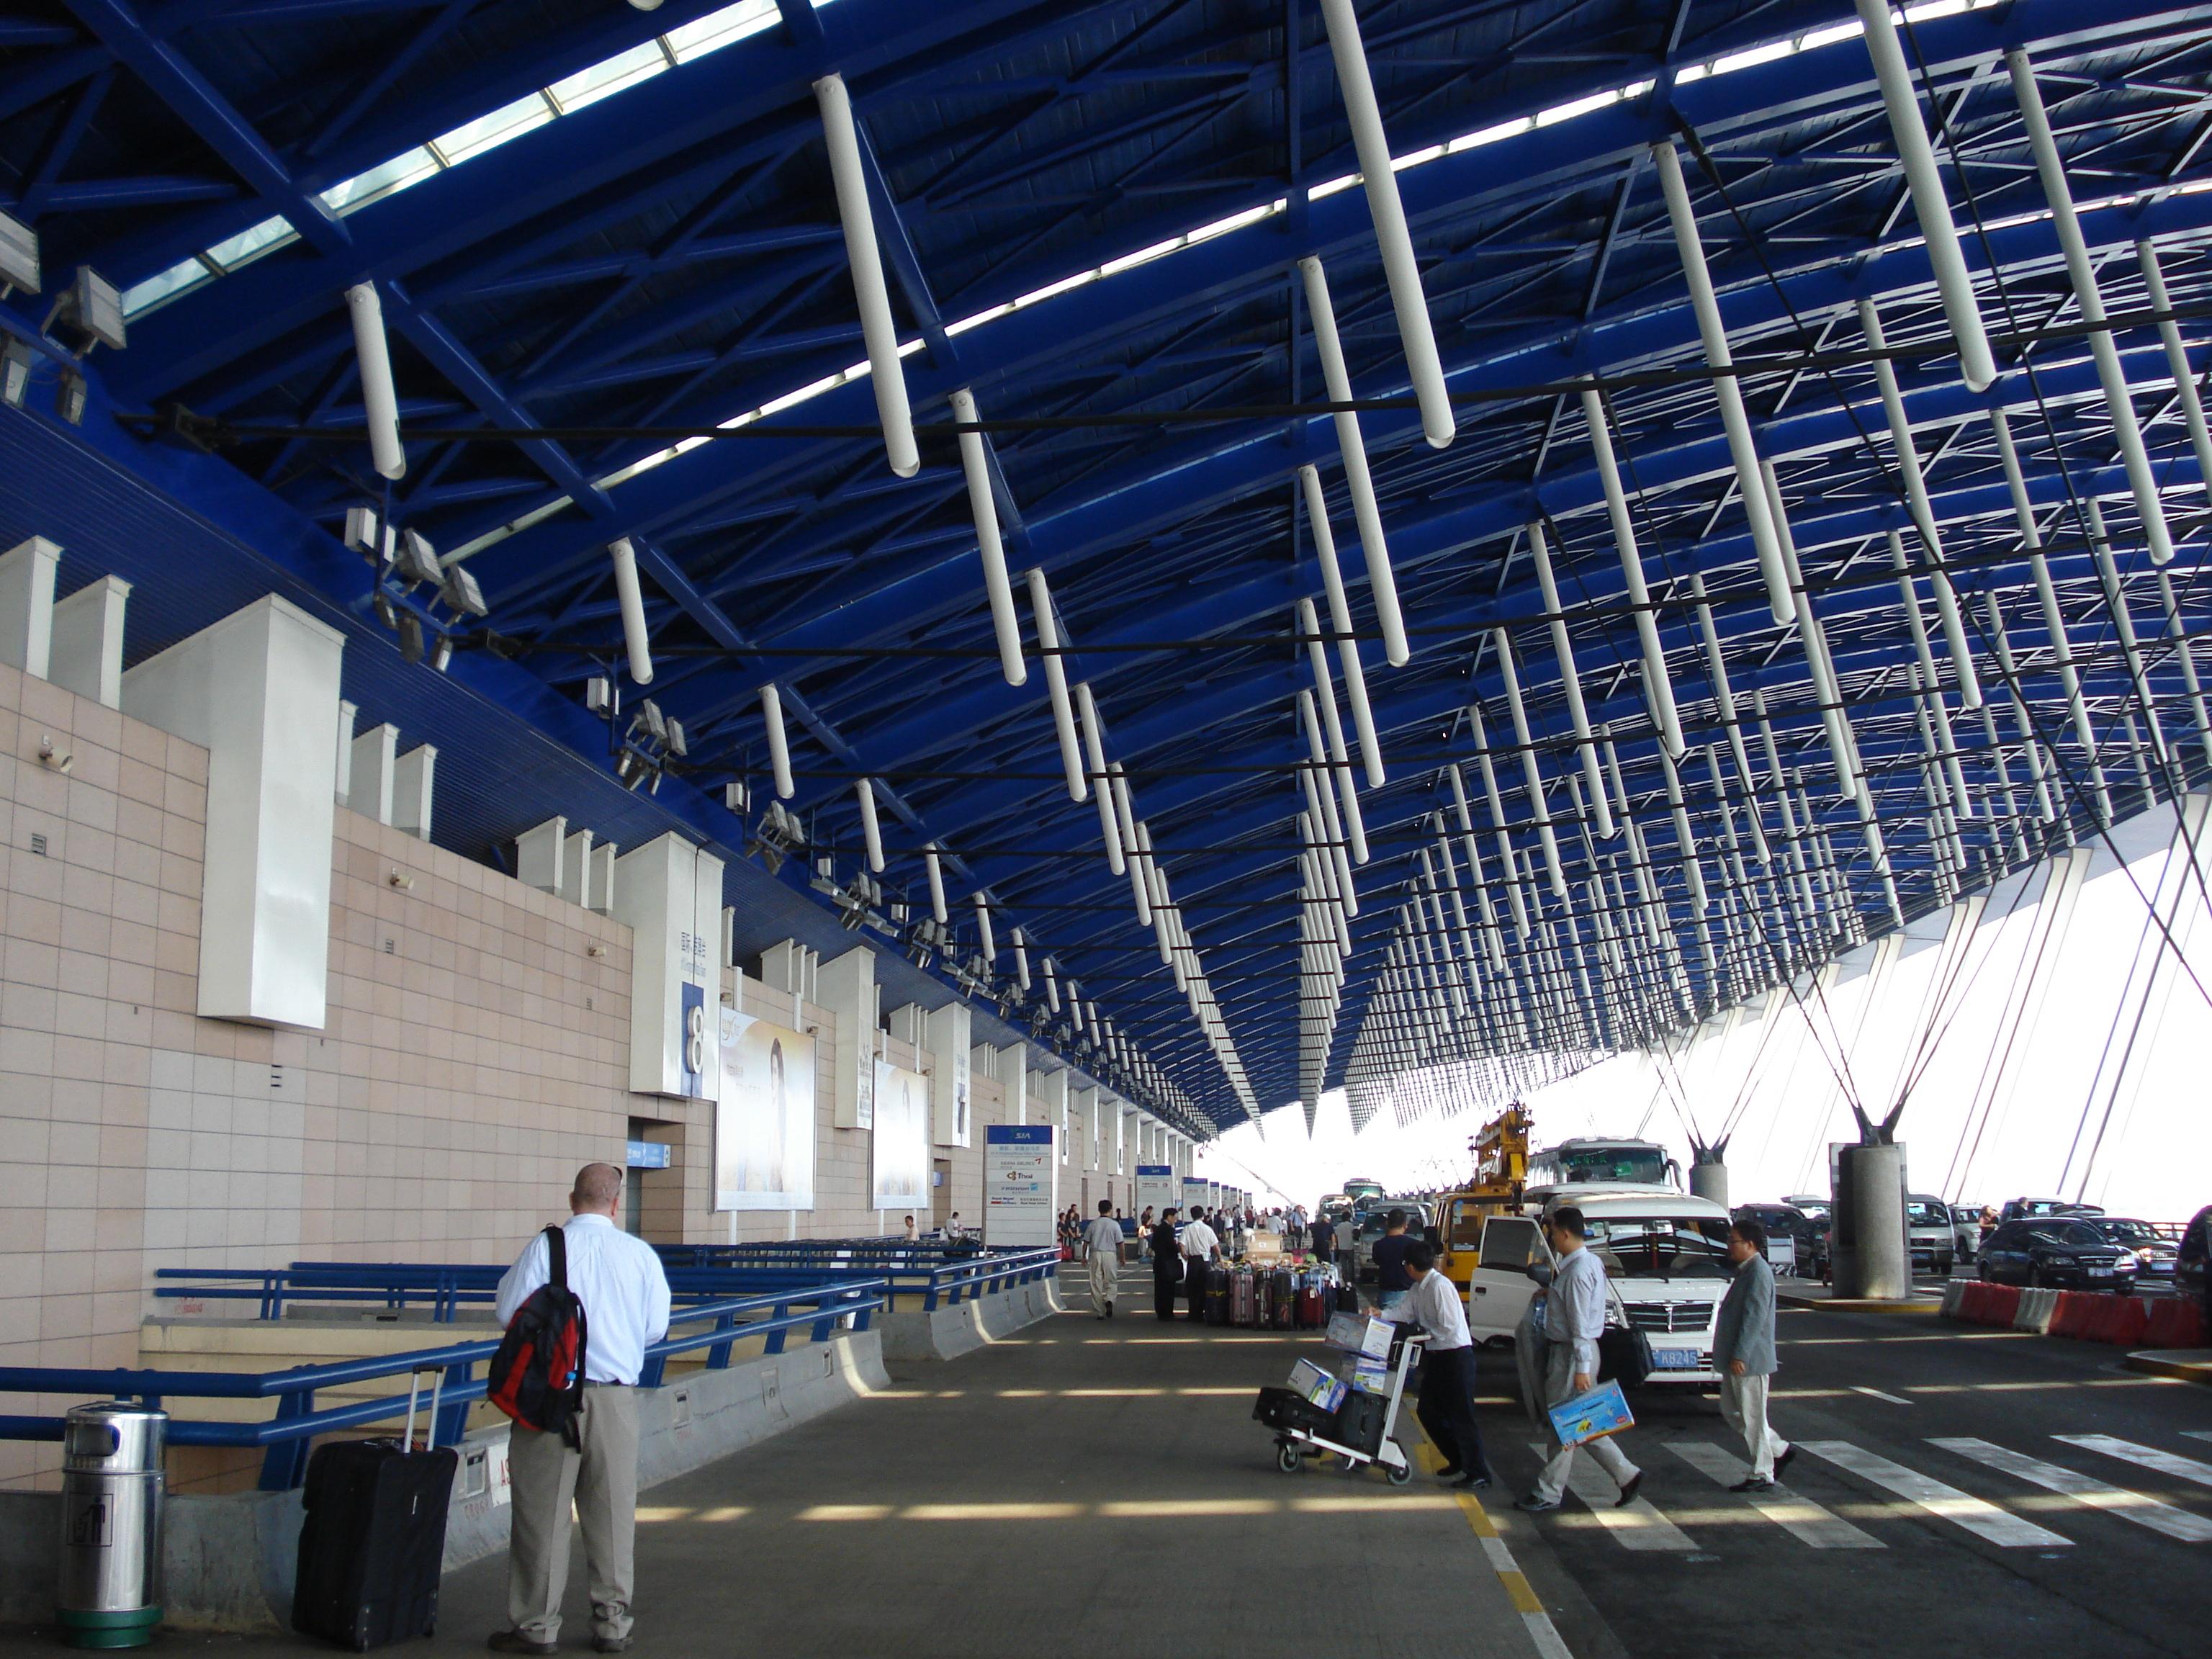 Aeroporto Xangai : Aeroporto internacional de xangai pudong wikiwand